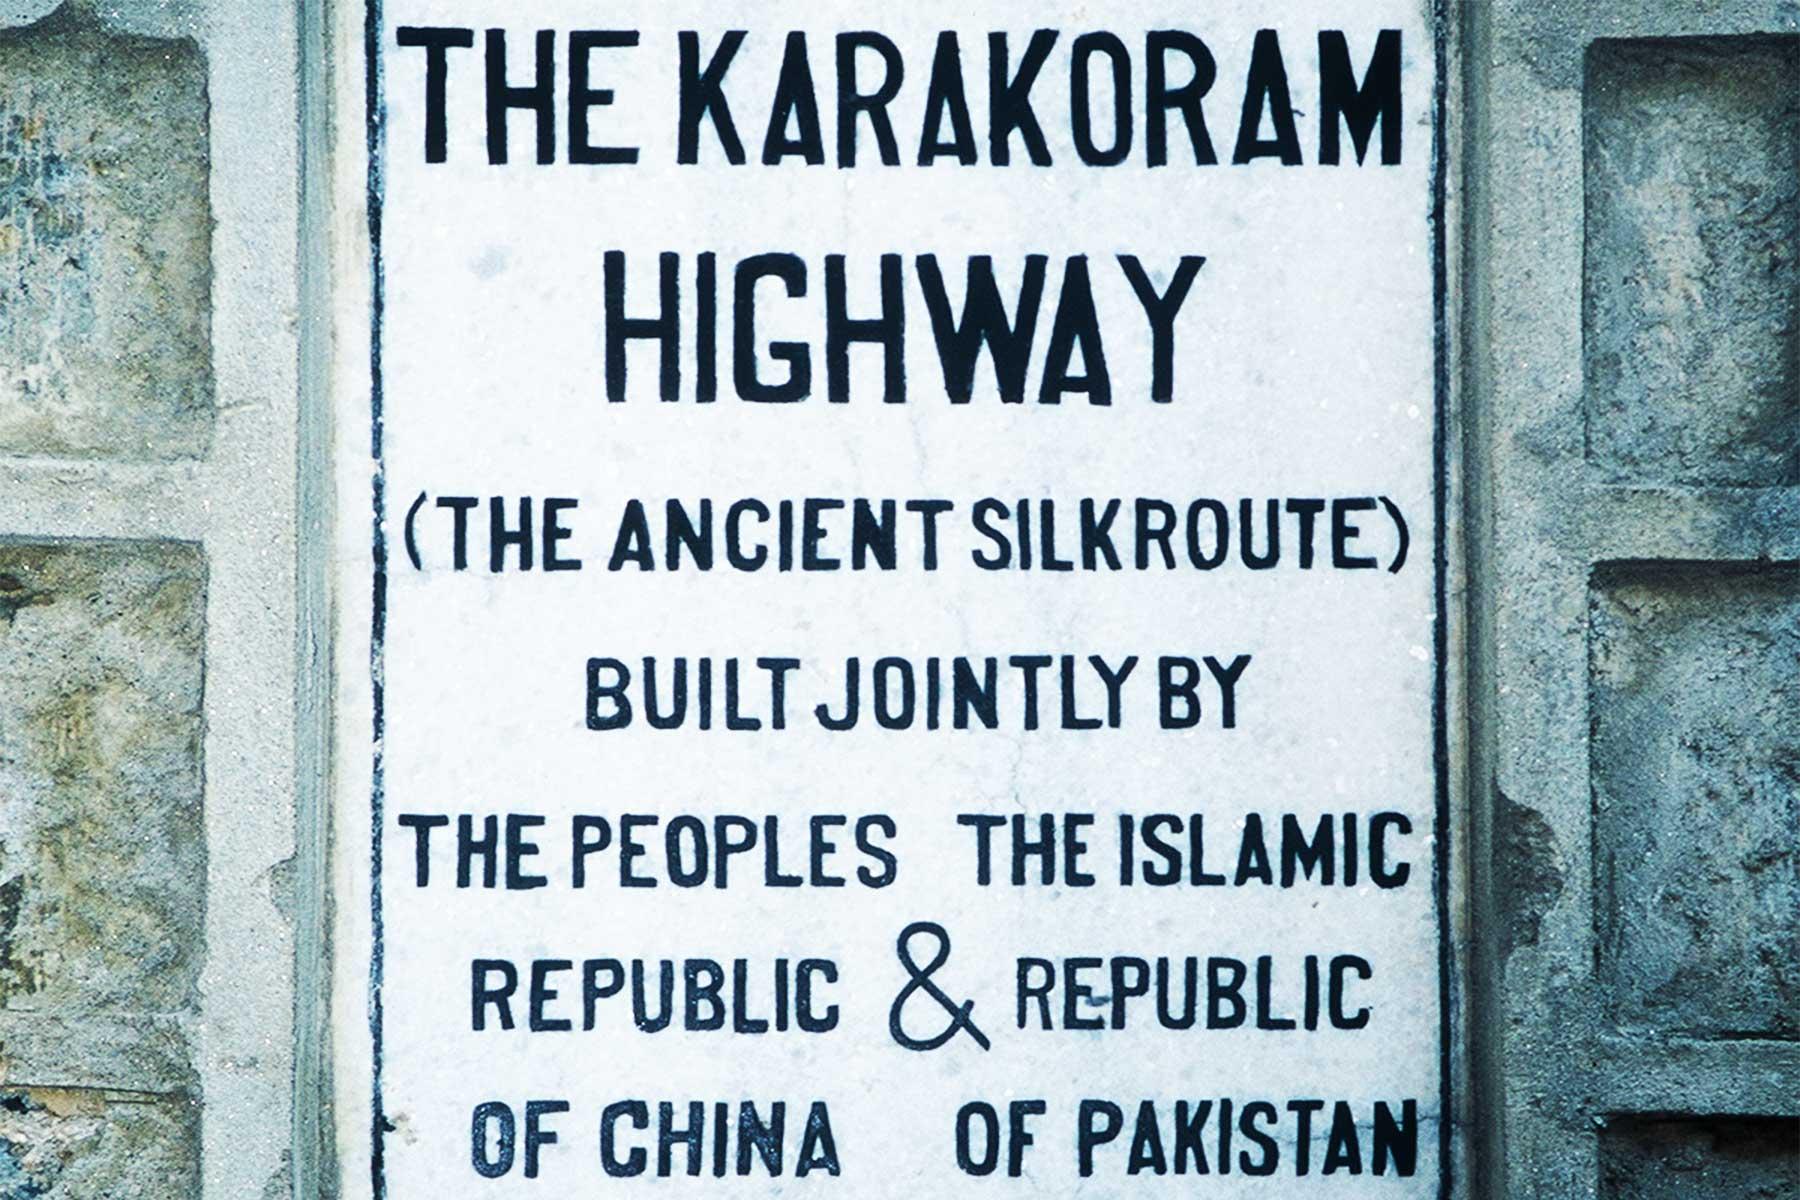 The Karakoram Highway - Ancient Silk Route - Islamic Republic Pakistan - Republic of China - Steven Martin